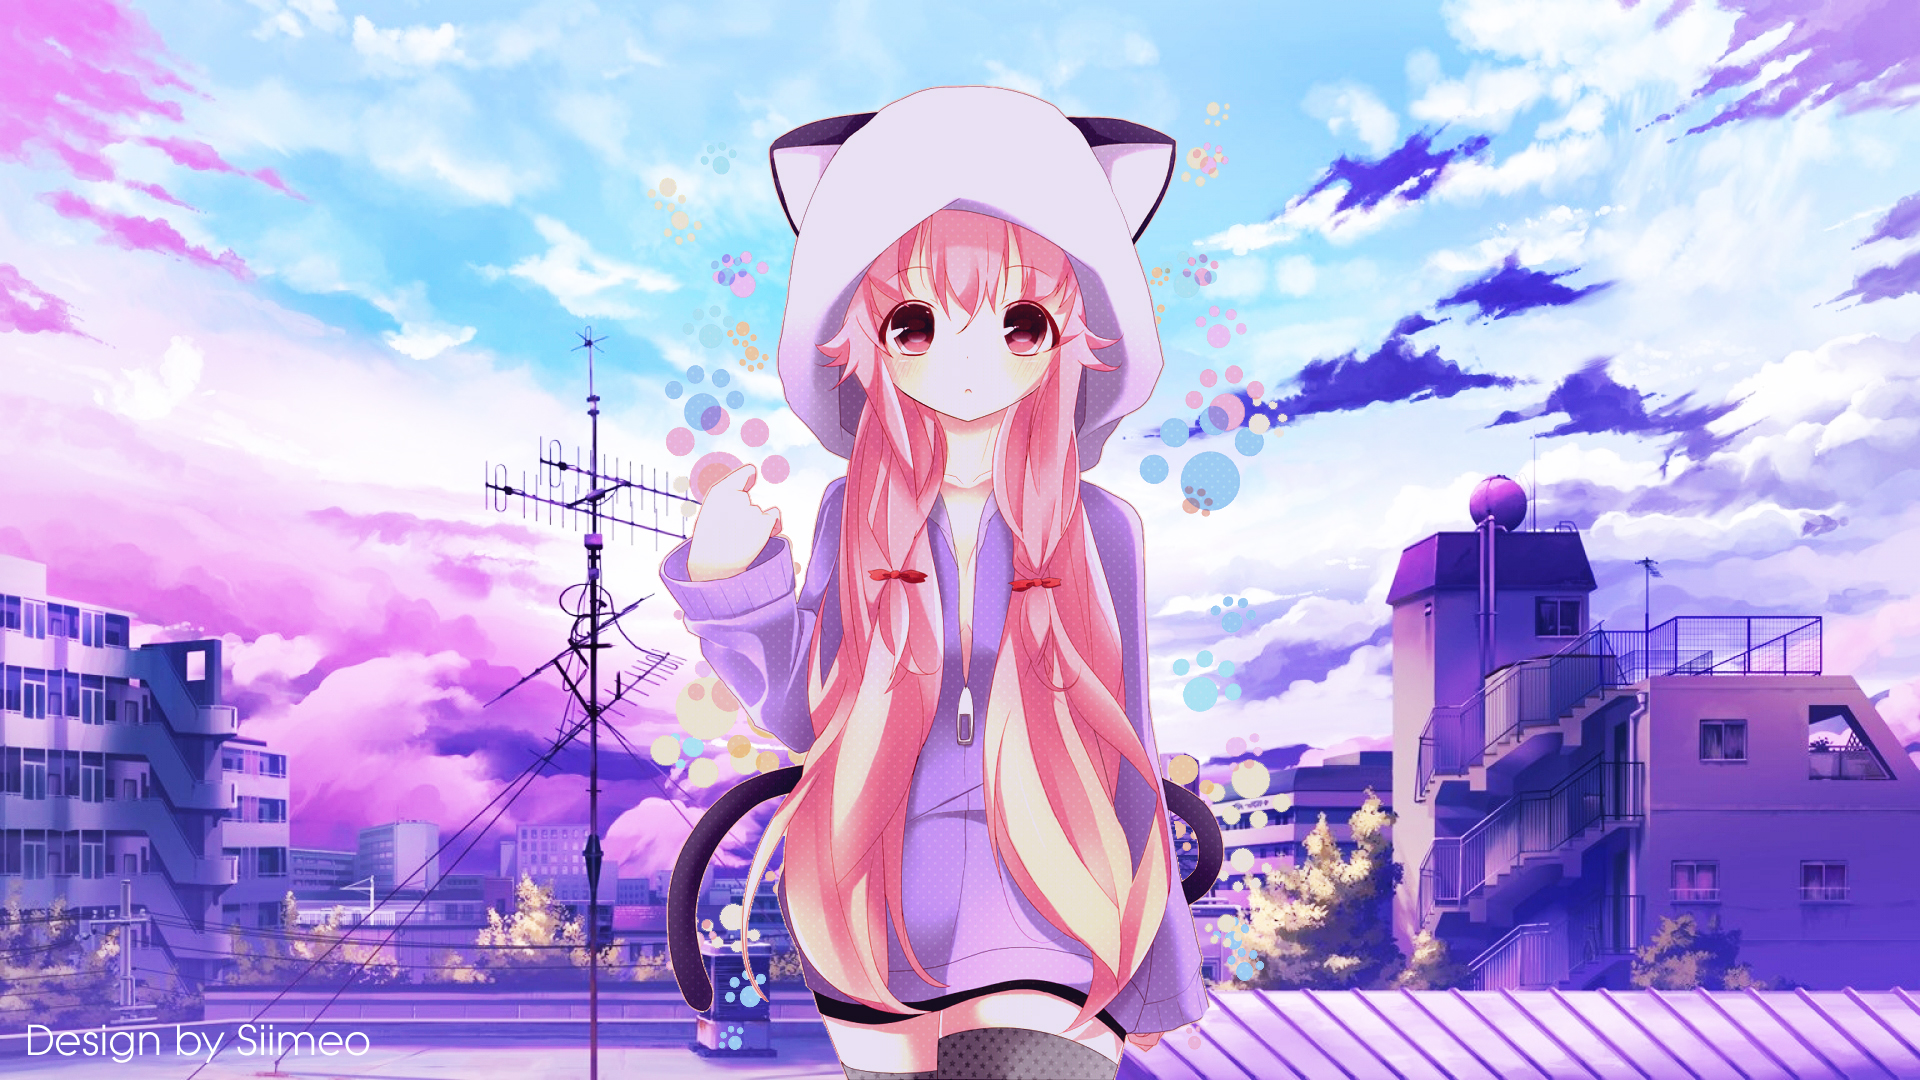 Anime Wallpapers Image 13